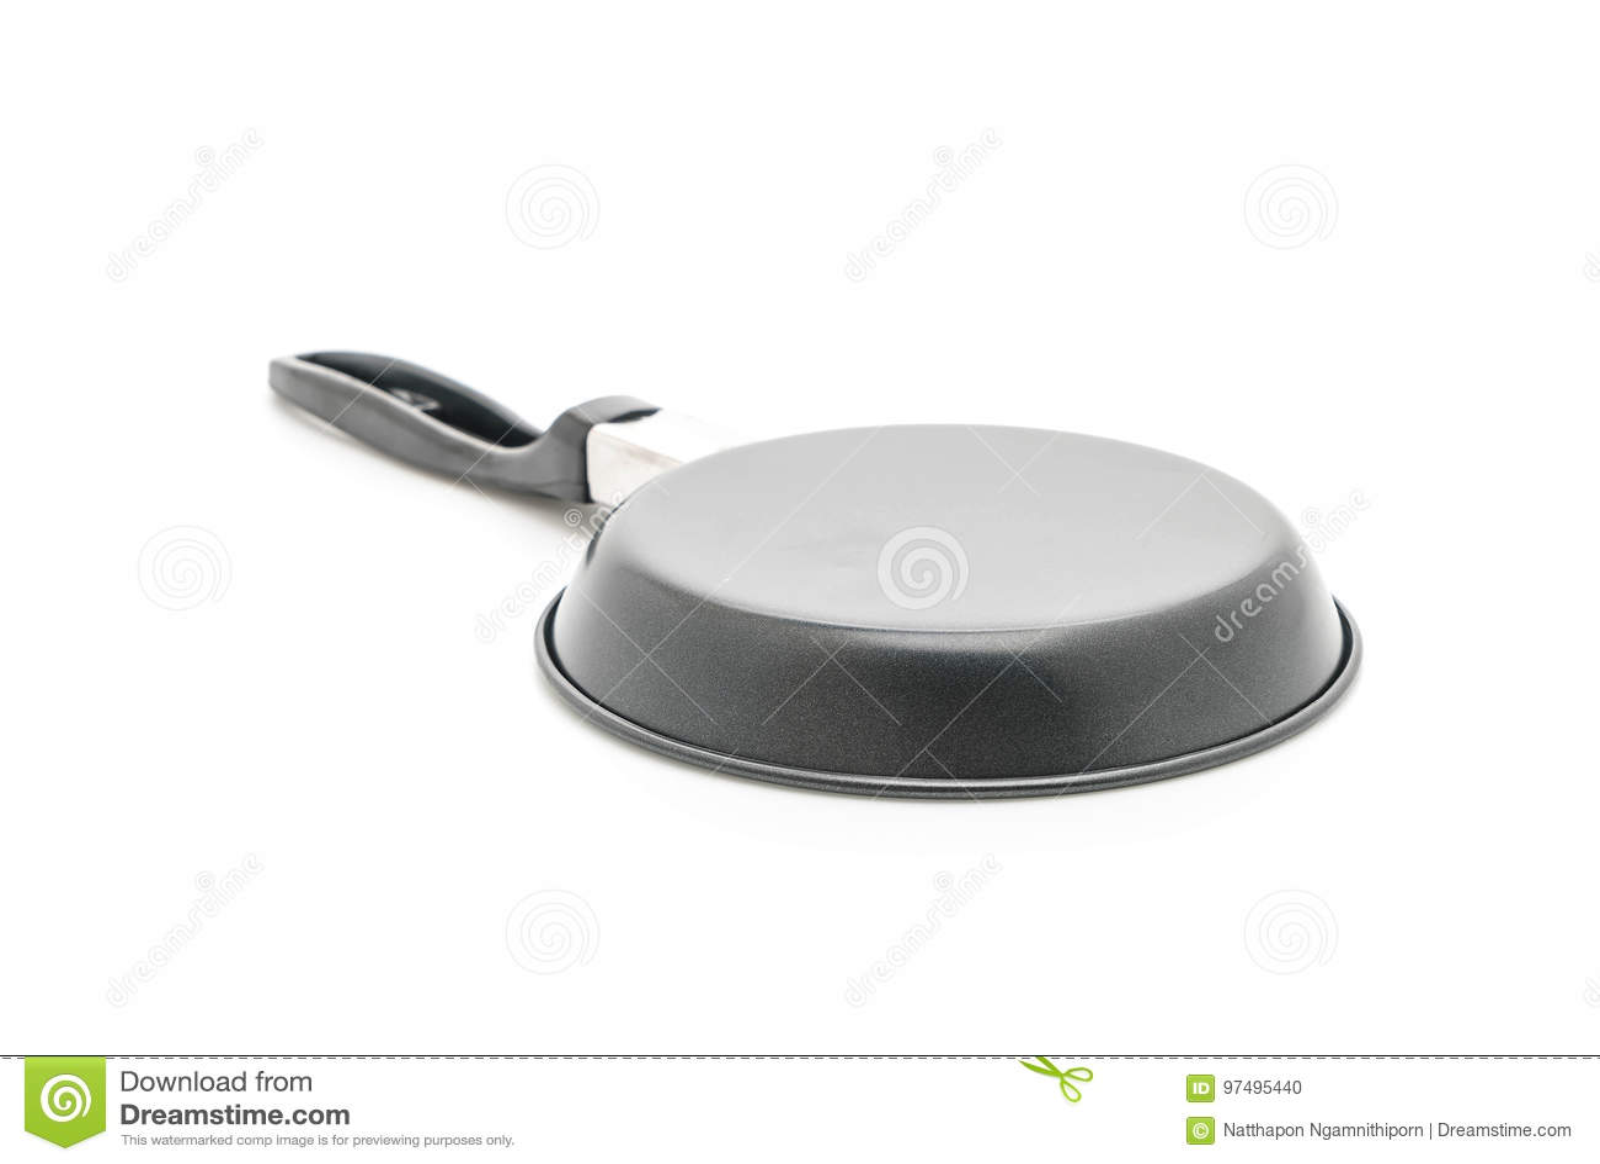 Vaschetta di frittura isolata su bianco